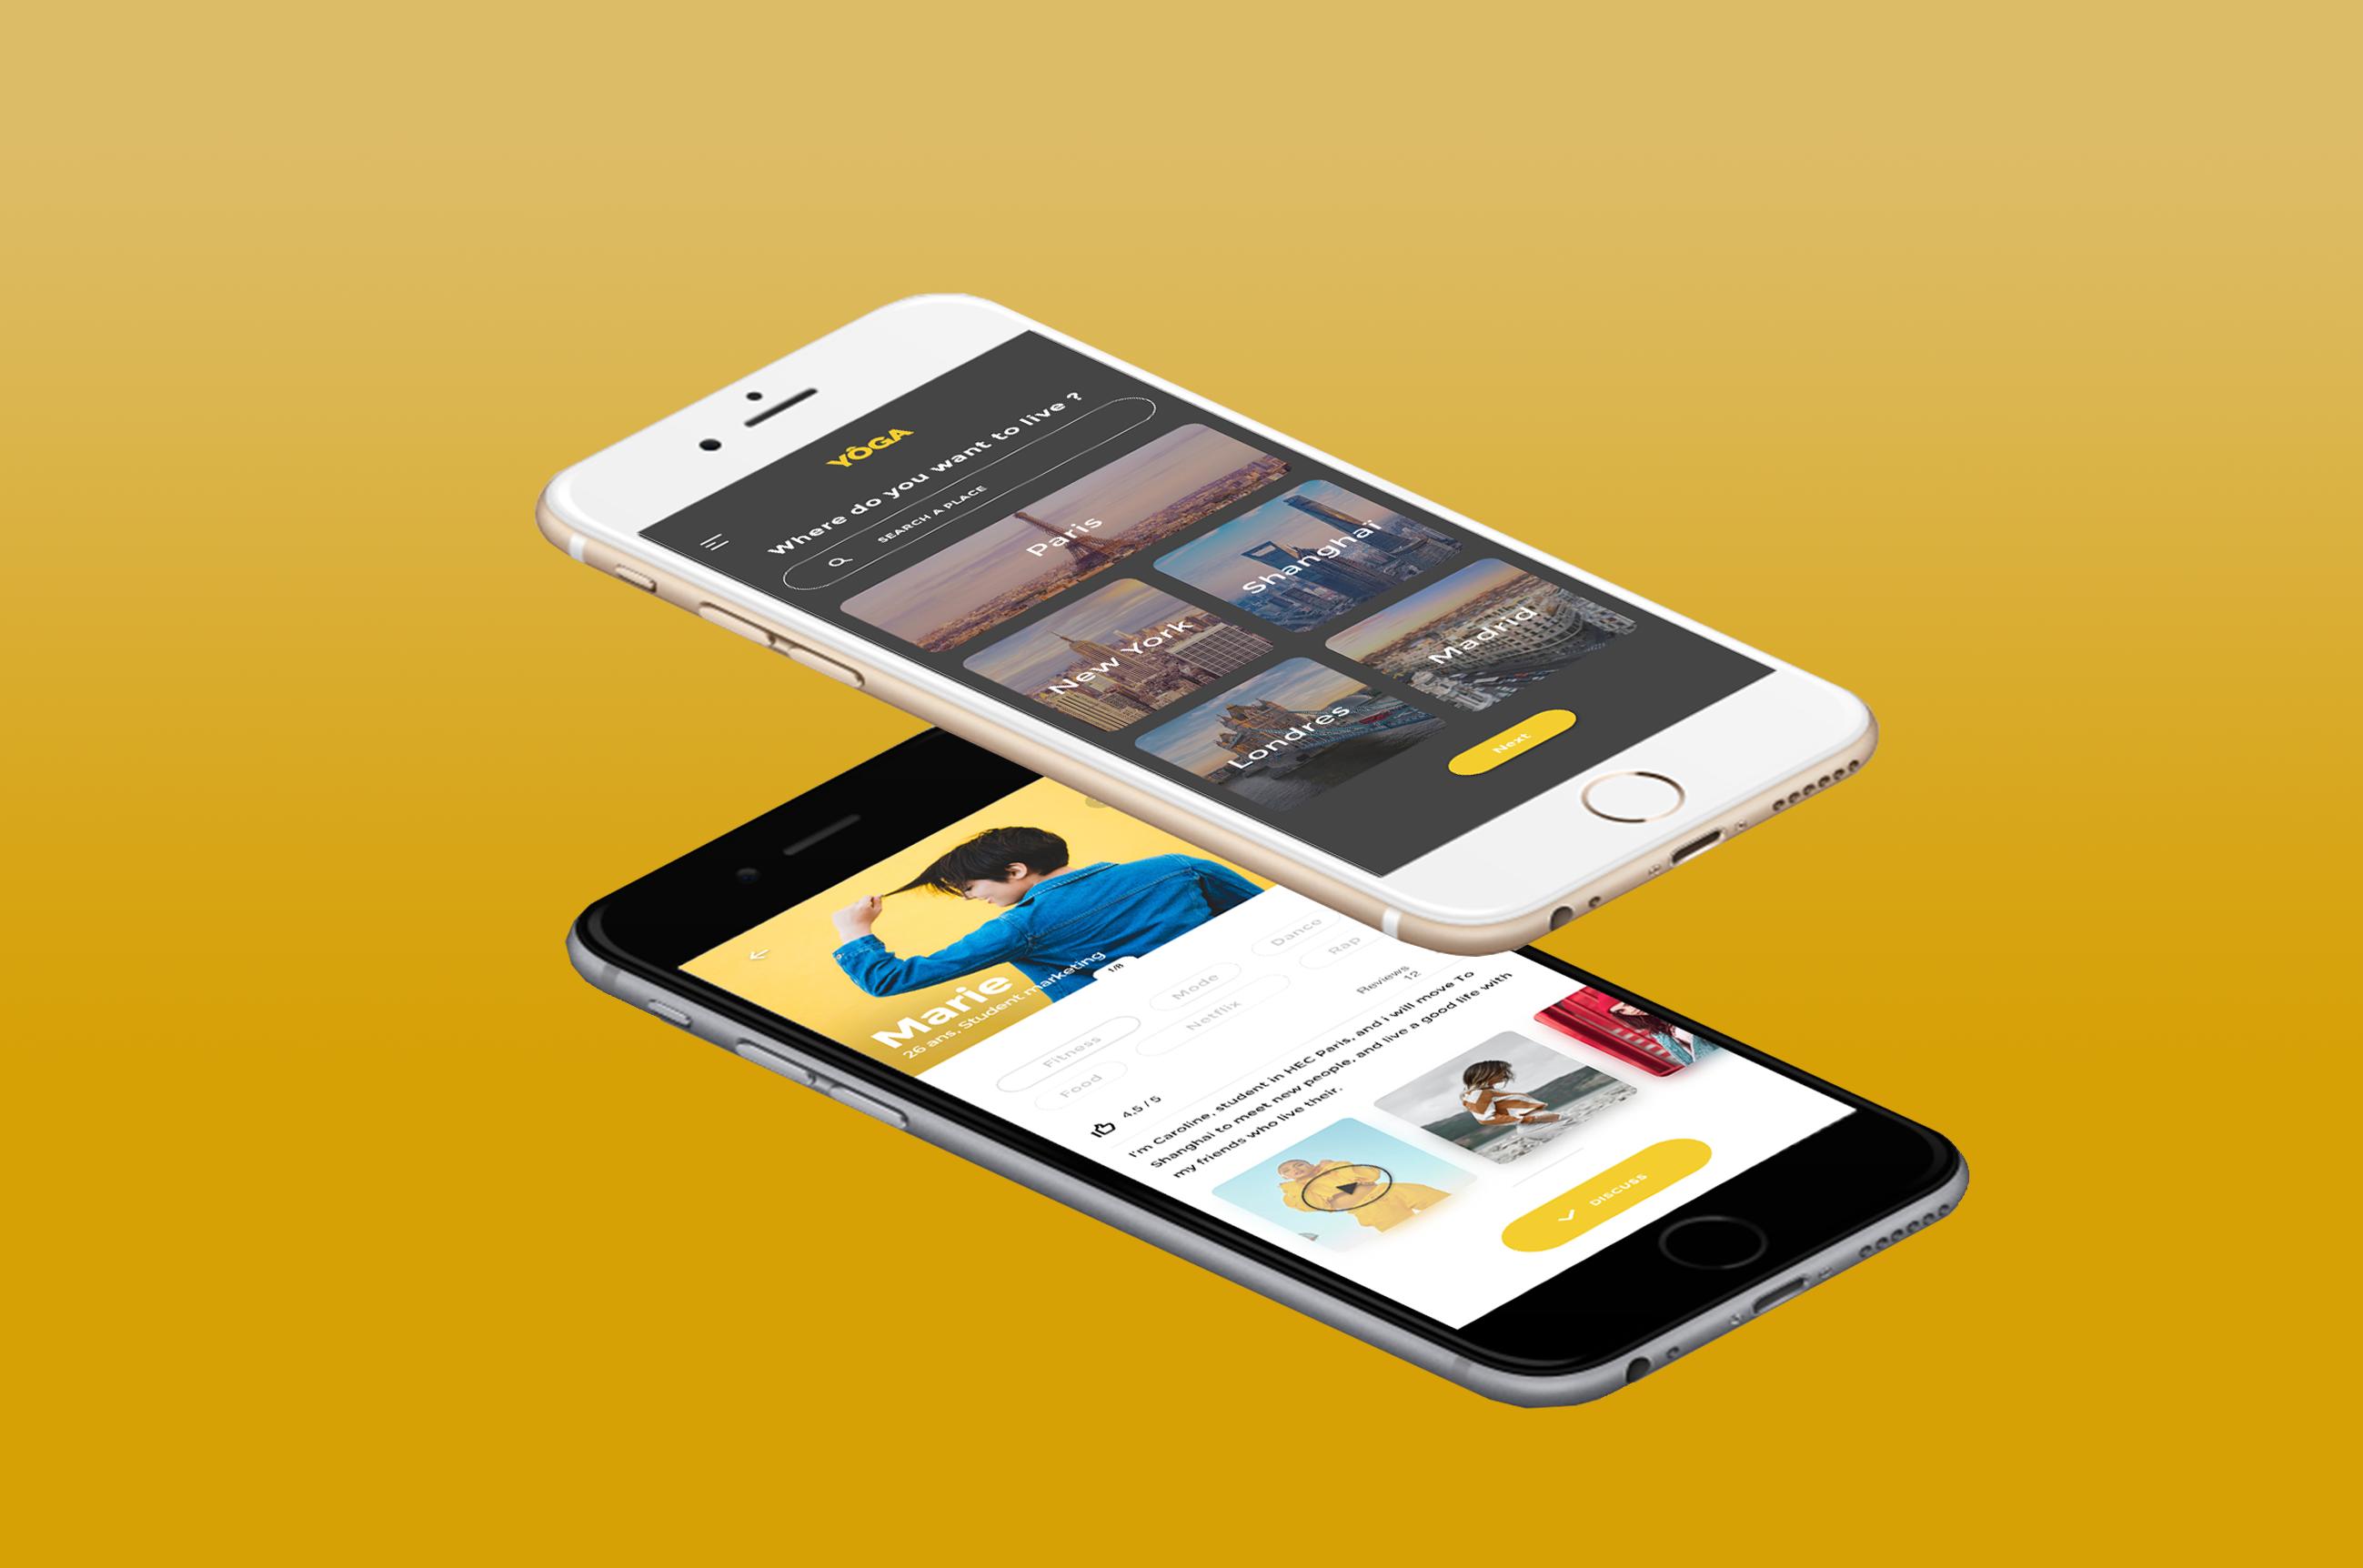 likeweb agency yoga paris shangai chinois marché ux/ui design développement création intégration ios android java swift